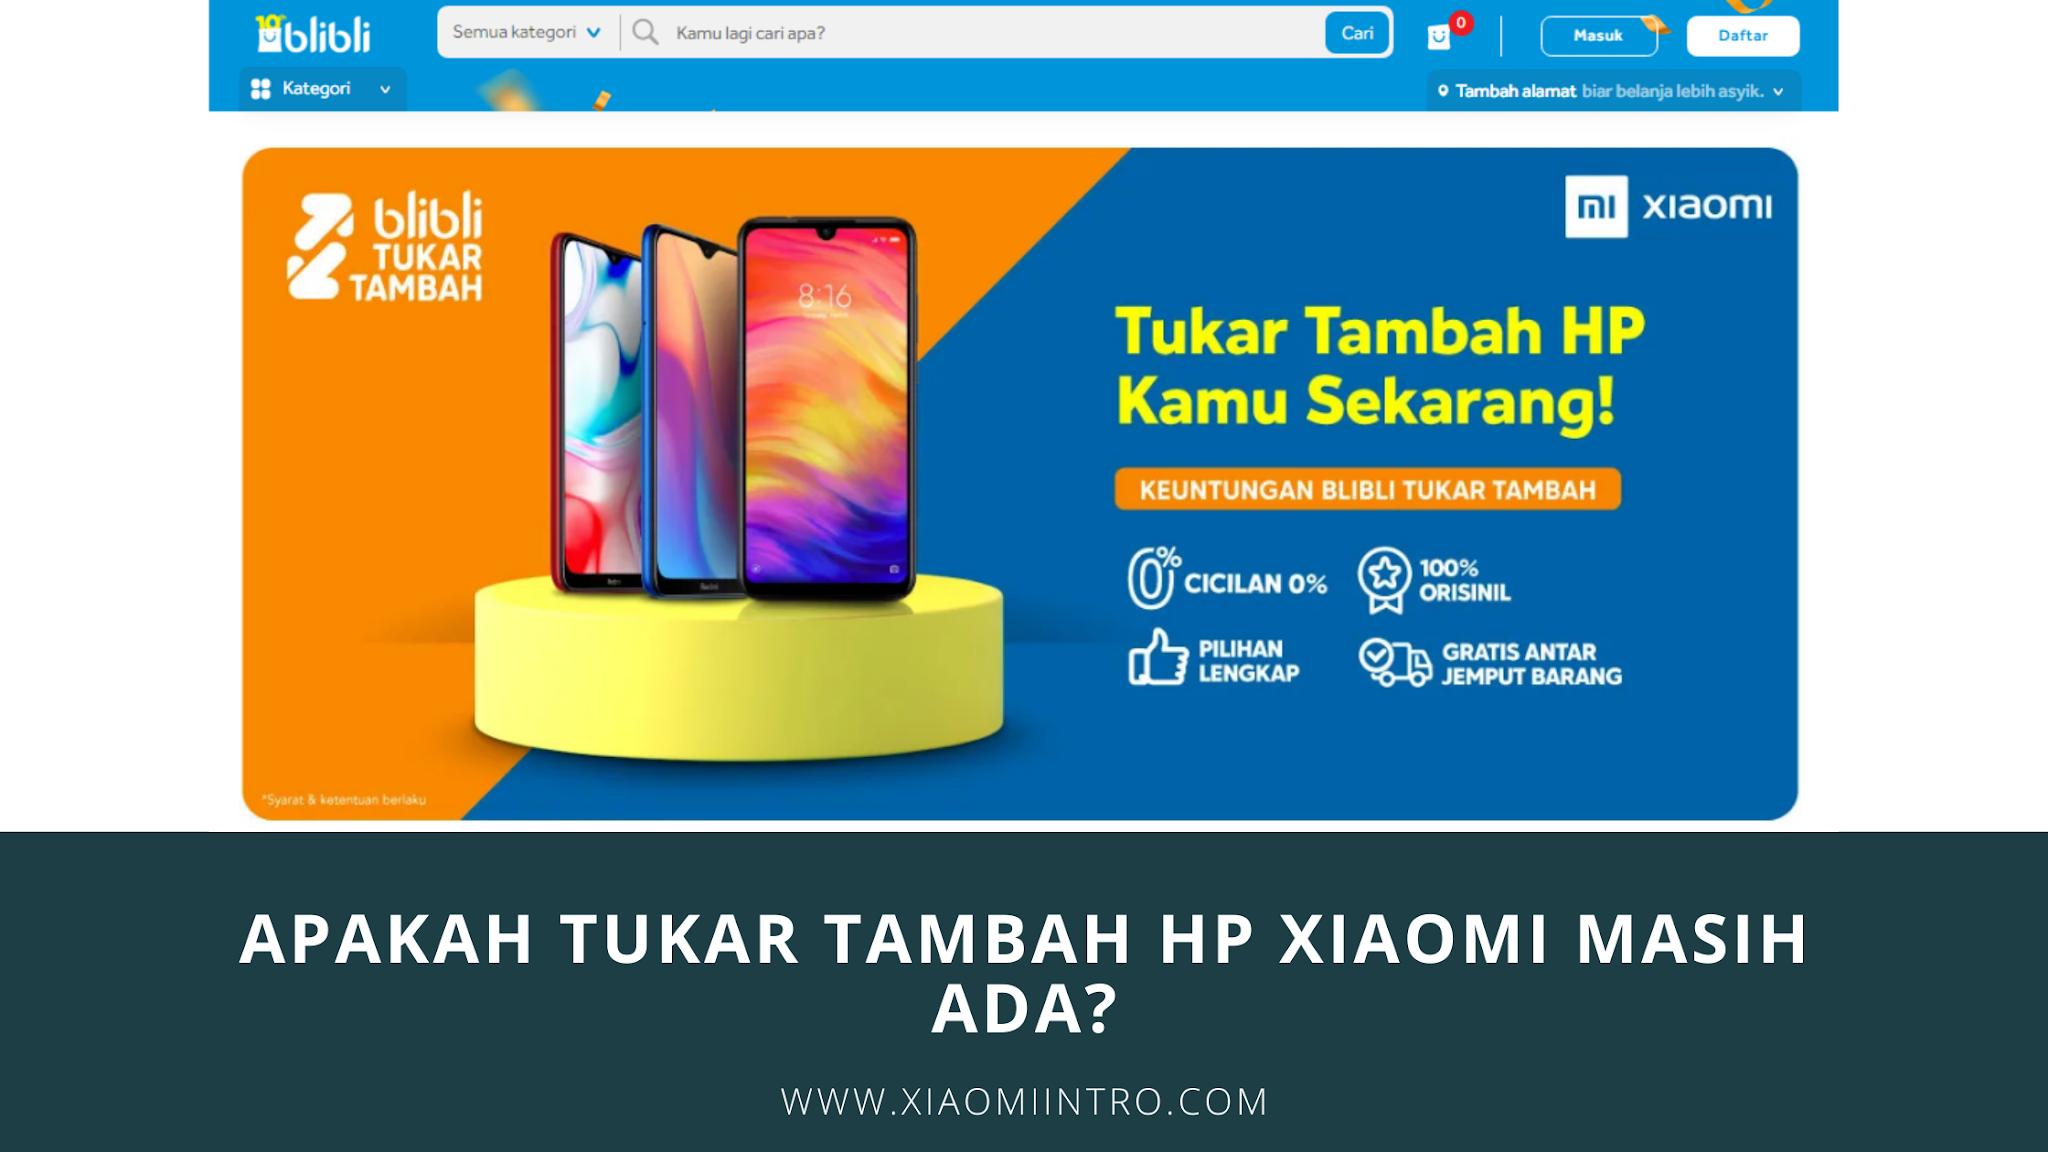 Apakah Tukar Tambah HP Xiaomi Masih Ada?